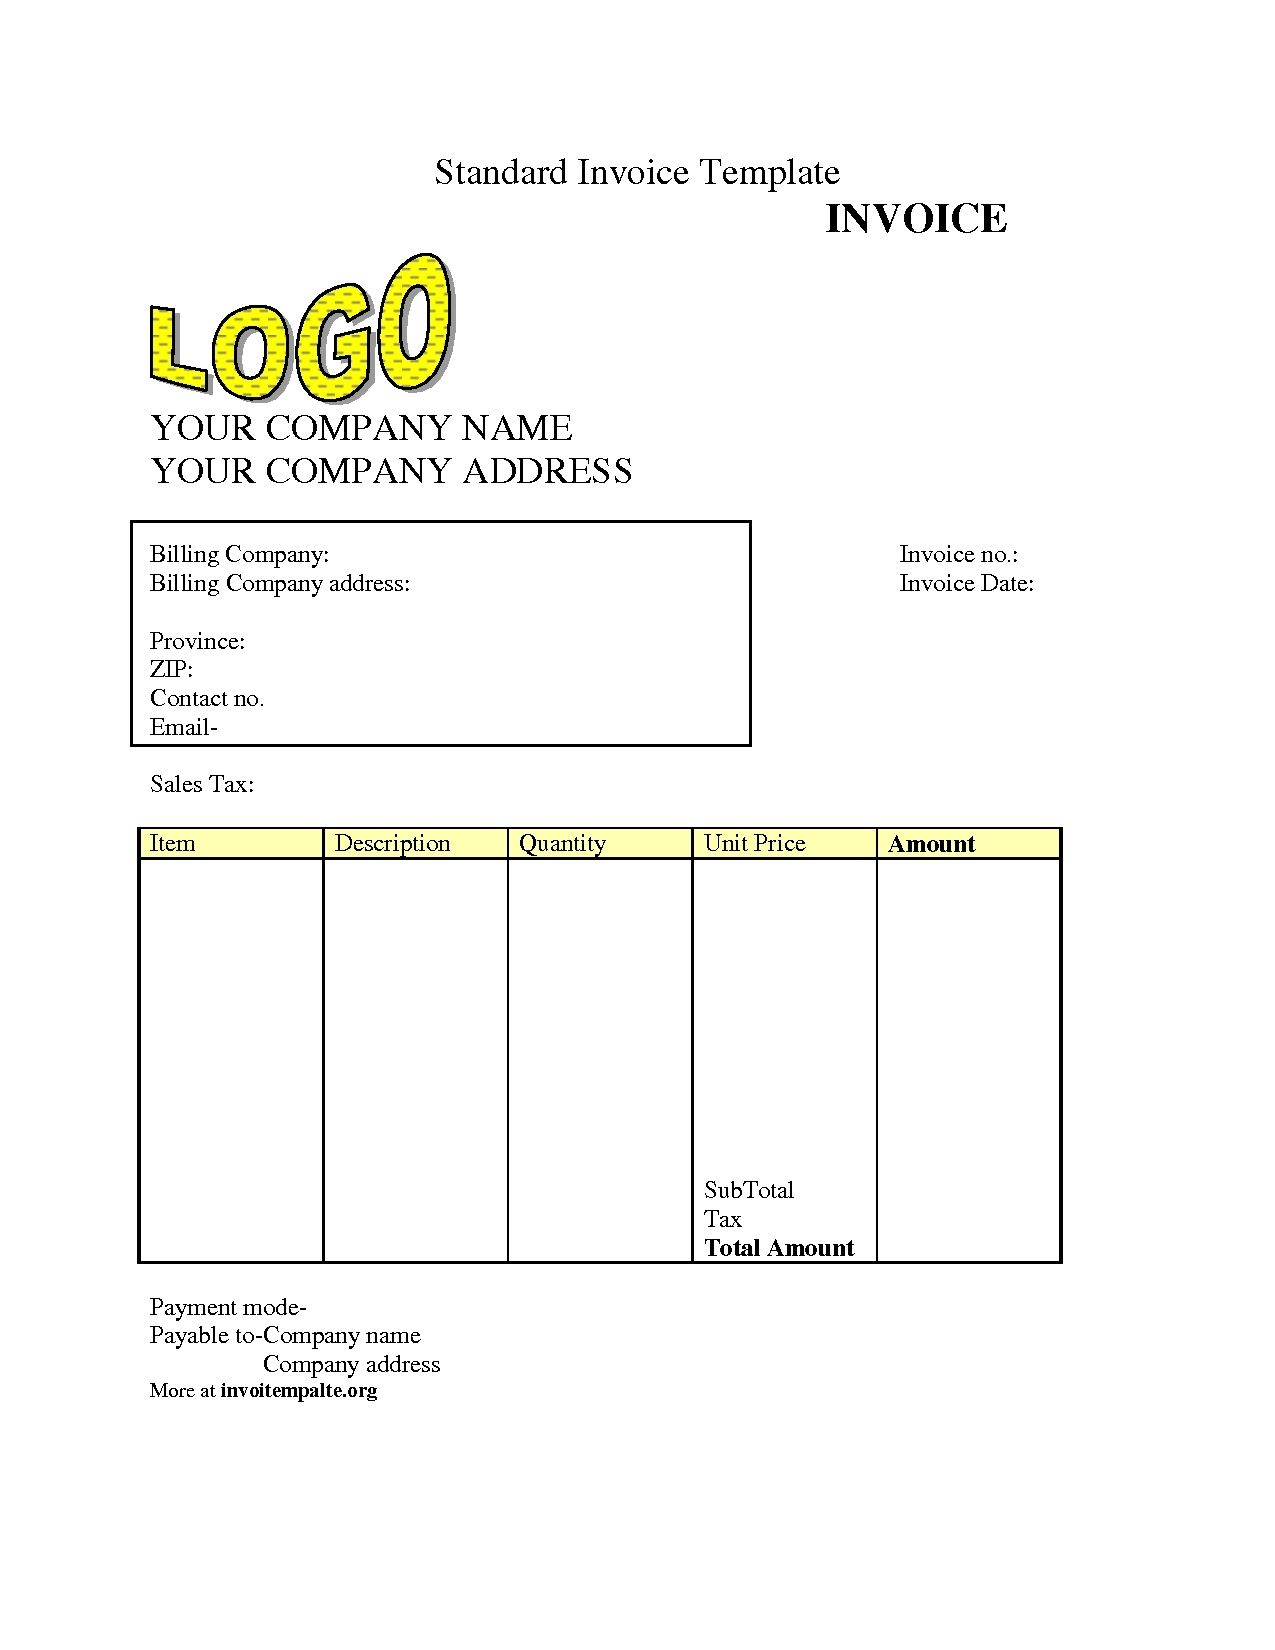 Free Invoice Template Downloads Invoice Template Free 2016 Free Invoice Templet Invoice Template Invoice Design Template Invoice Template Word